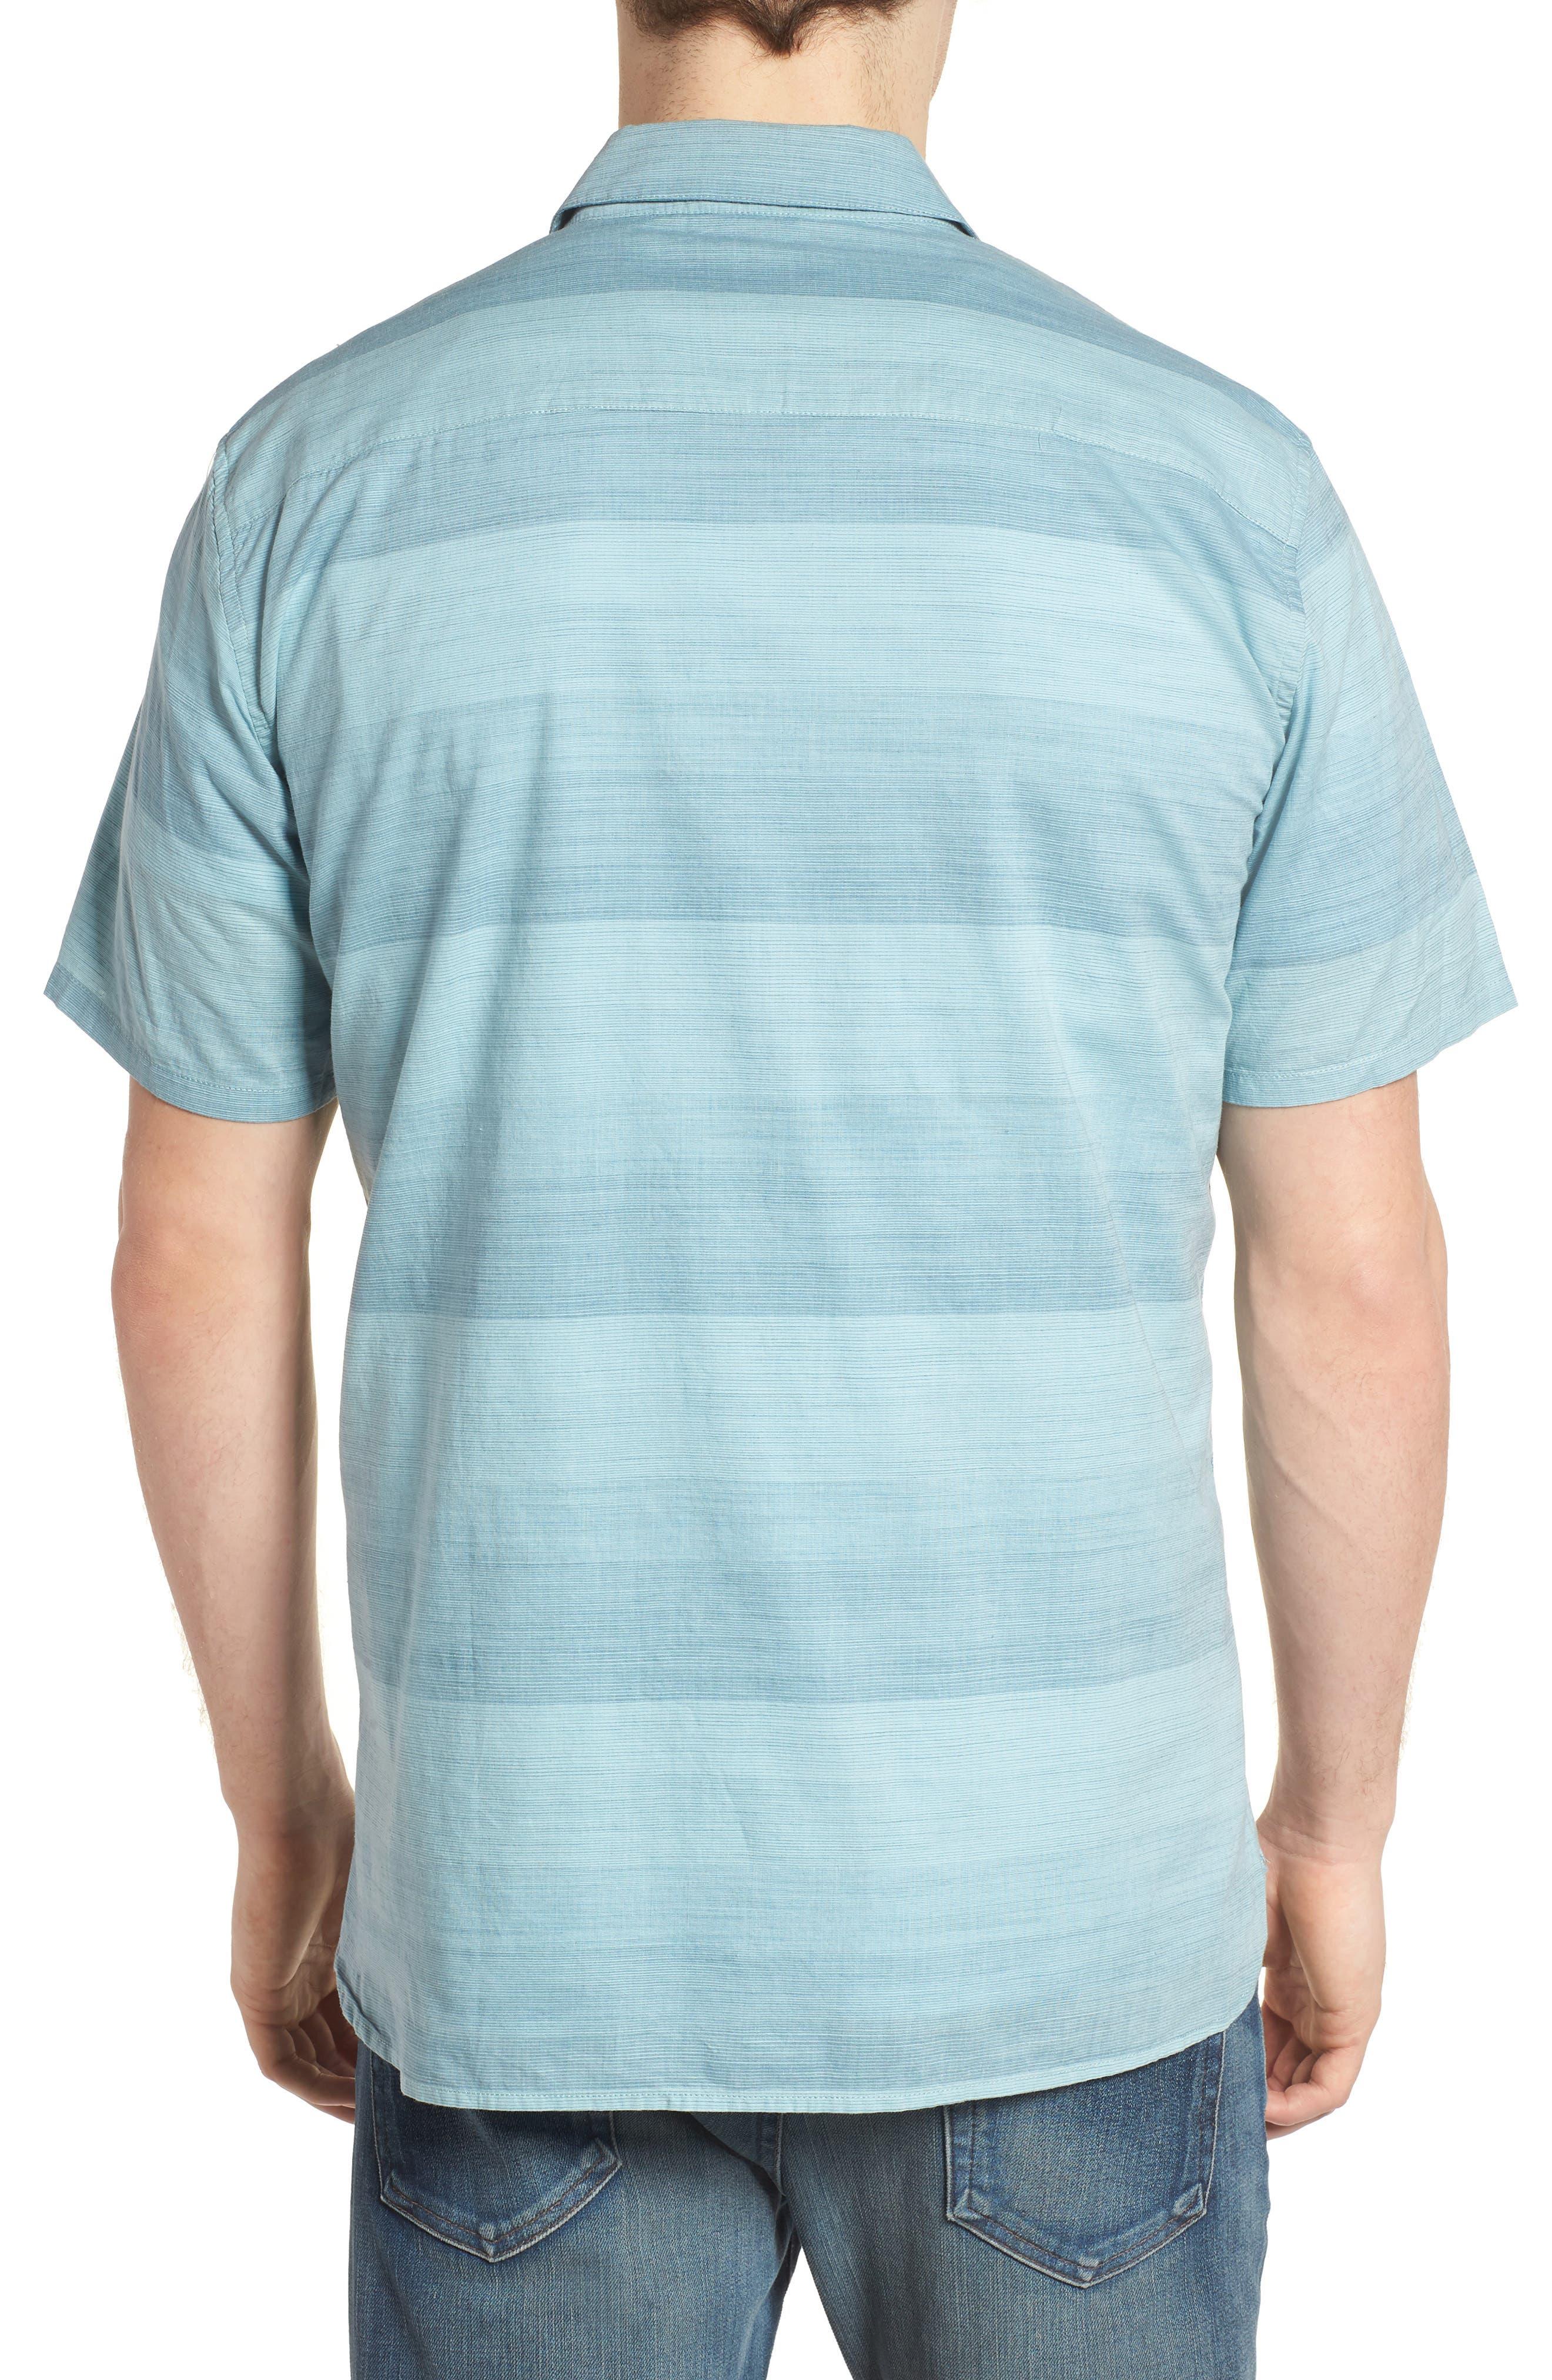 Morris Shirt,                             Alternate thumbnail 2, color,                             NOISE AQUA